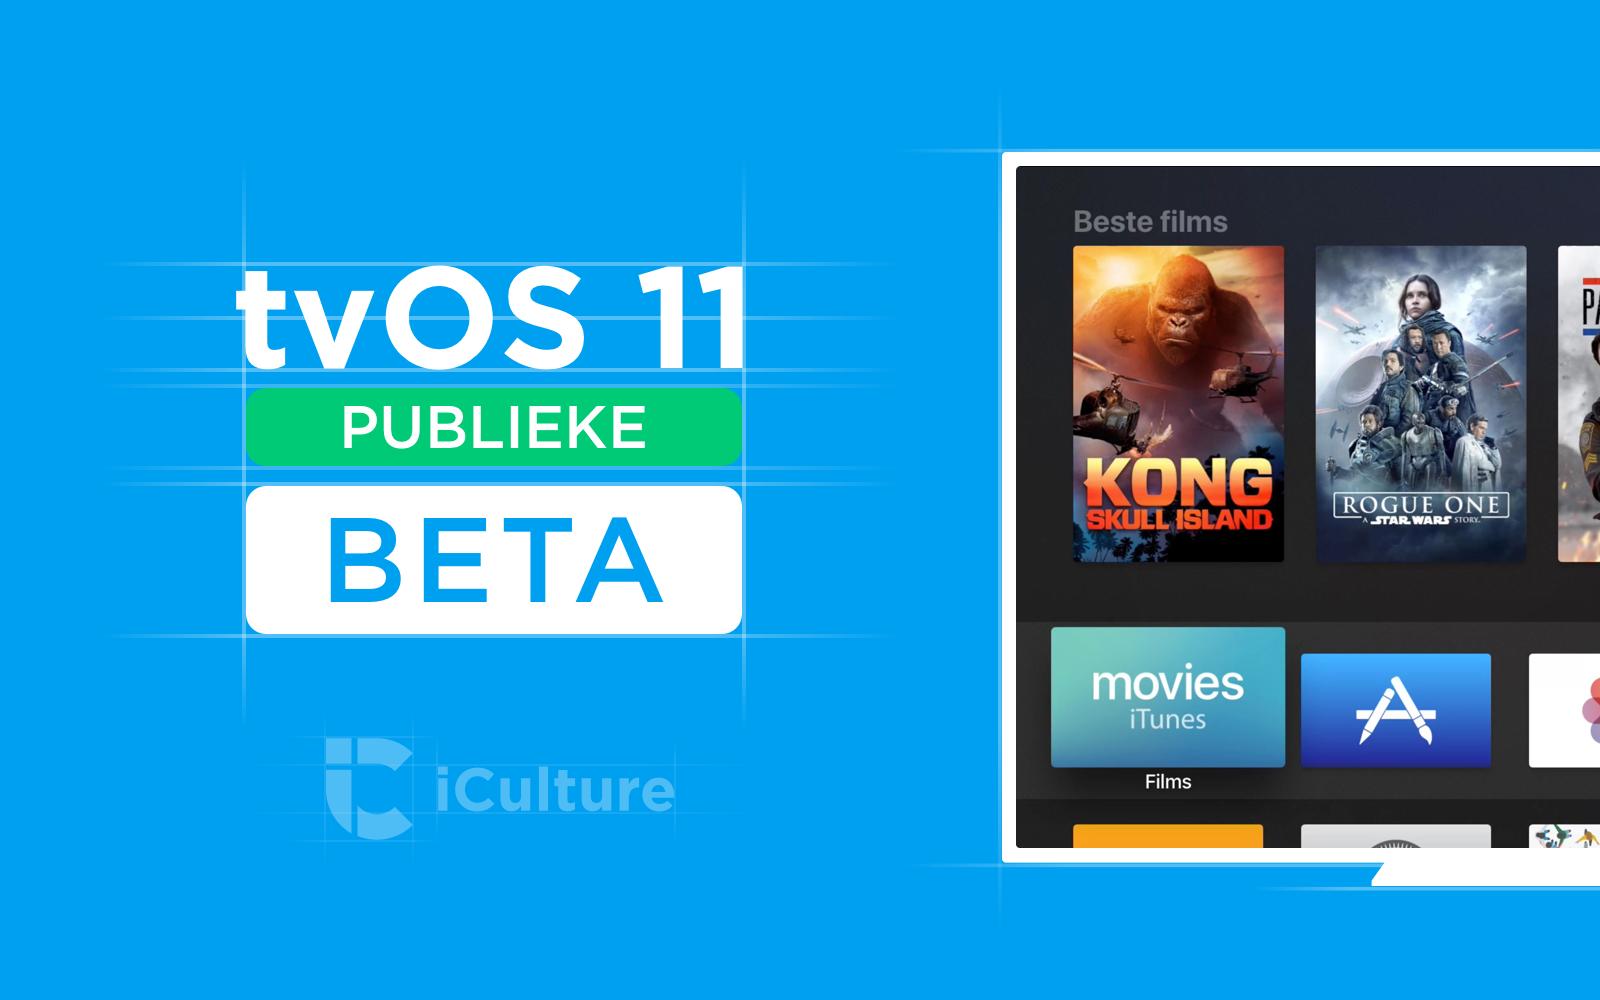 tvOS 11 Publieke beta